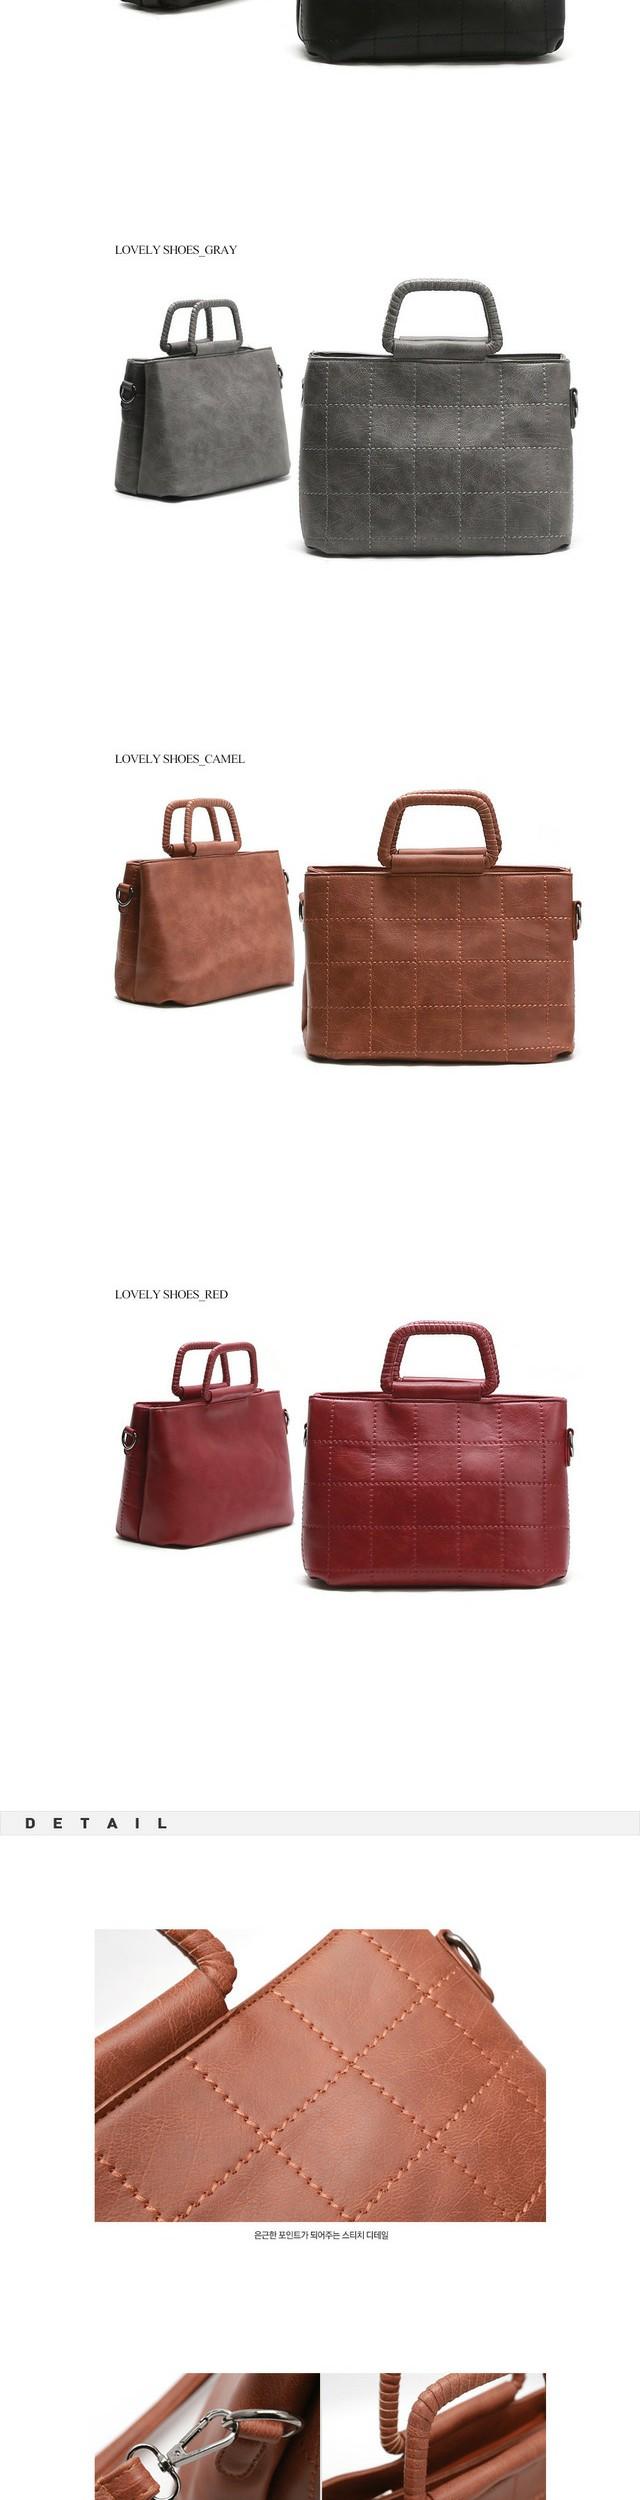 Lotnon Cross Bag